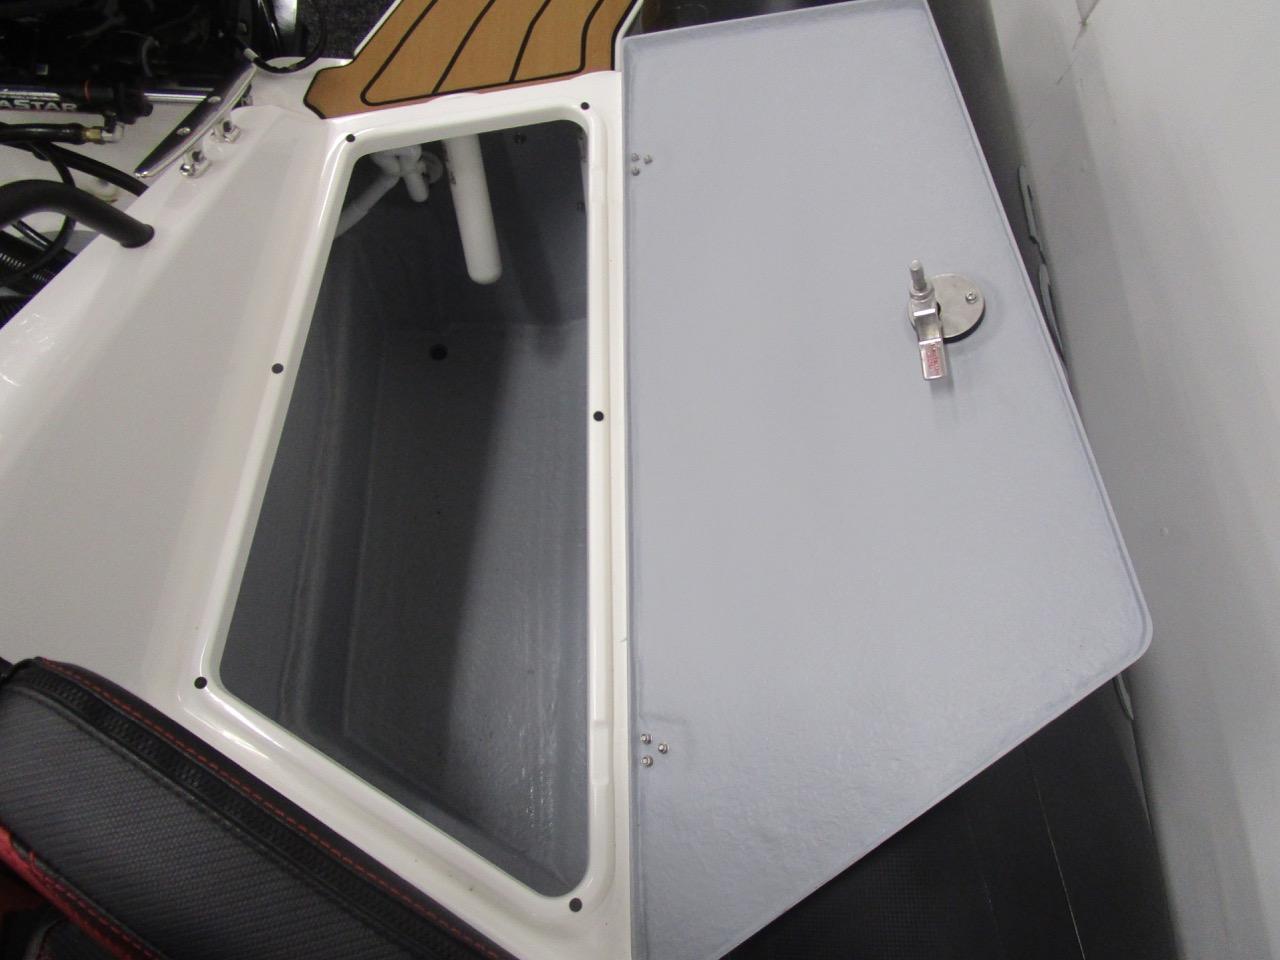 GRAND DRIVE D600 RIB huge rear locker open